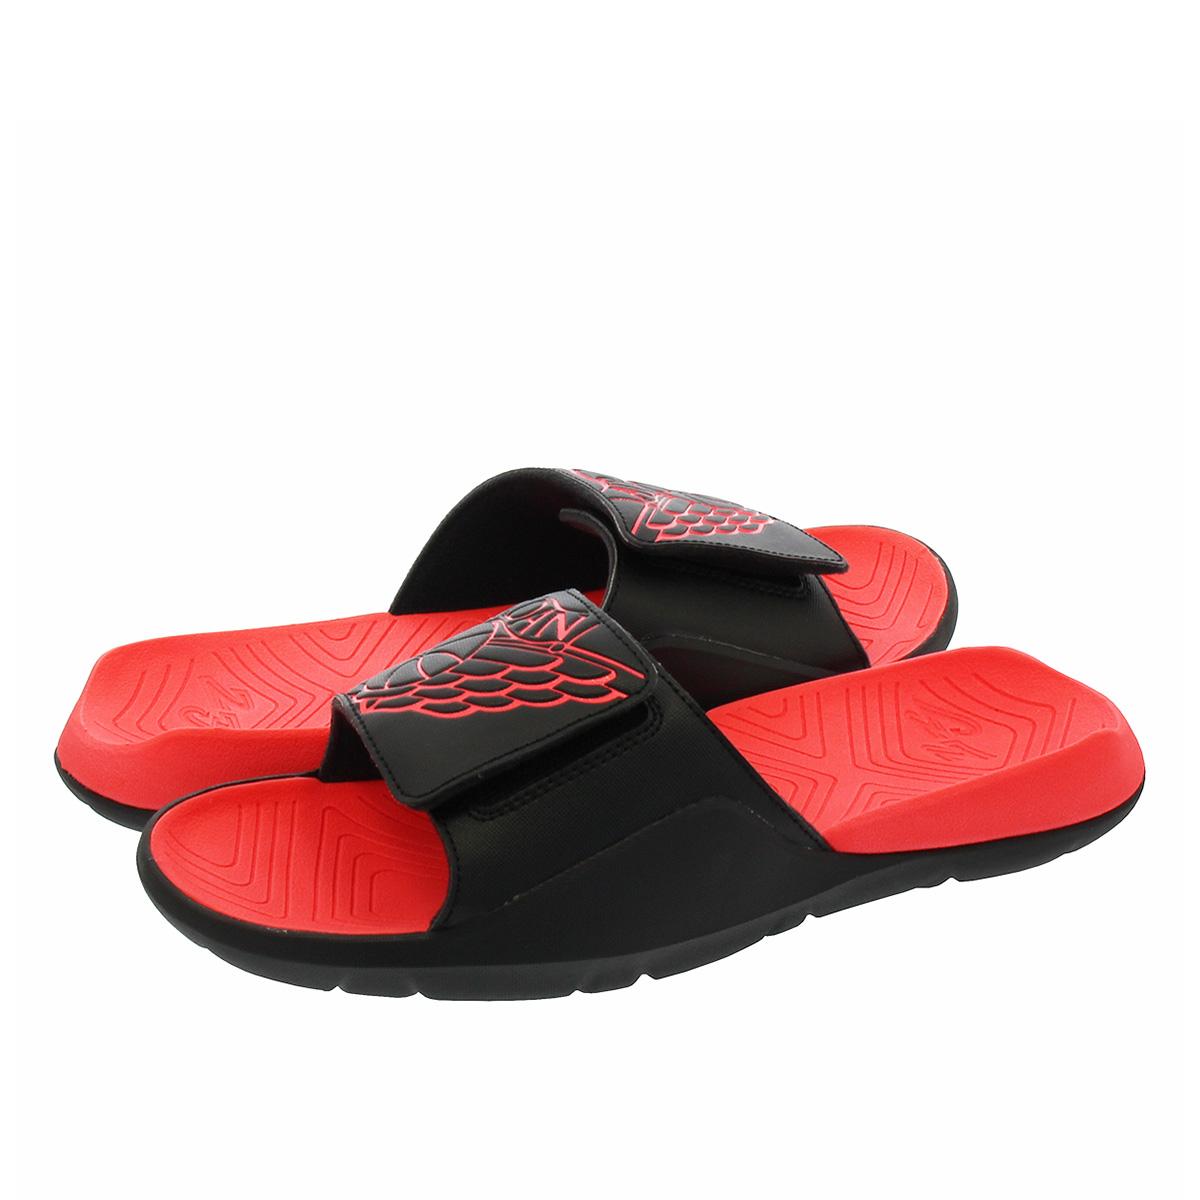 d8db0a60e9a69c LOWTEX BIG-SMALL SHOP  NIKE JORDAN HYDRO 7 Nike Jordan high mud 7 BLACK INFRARED  23